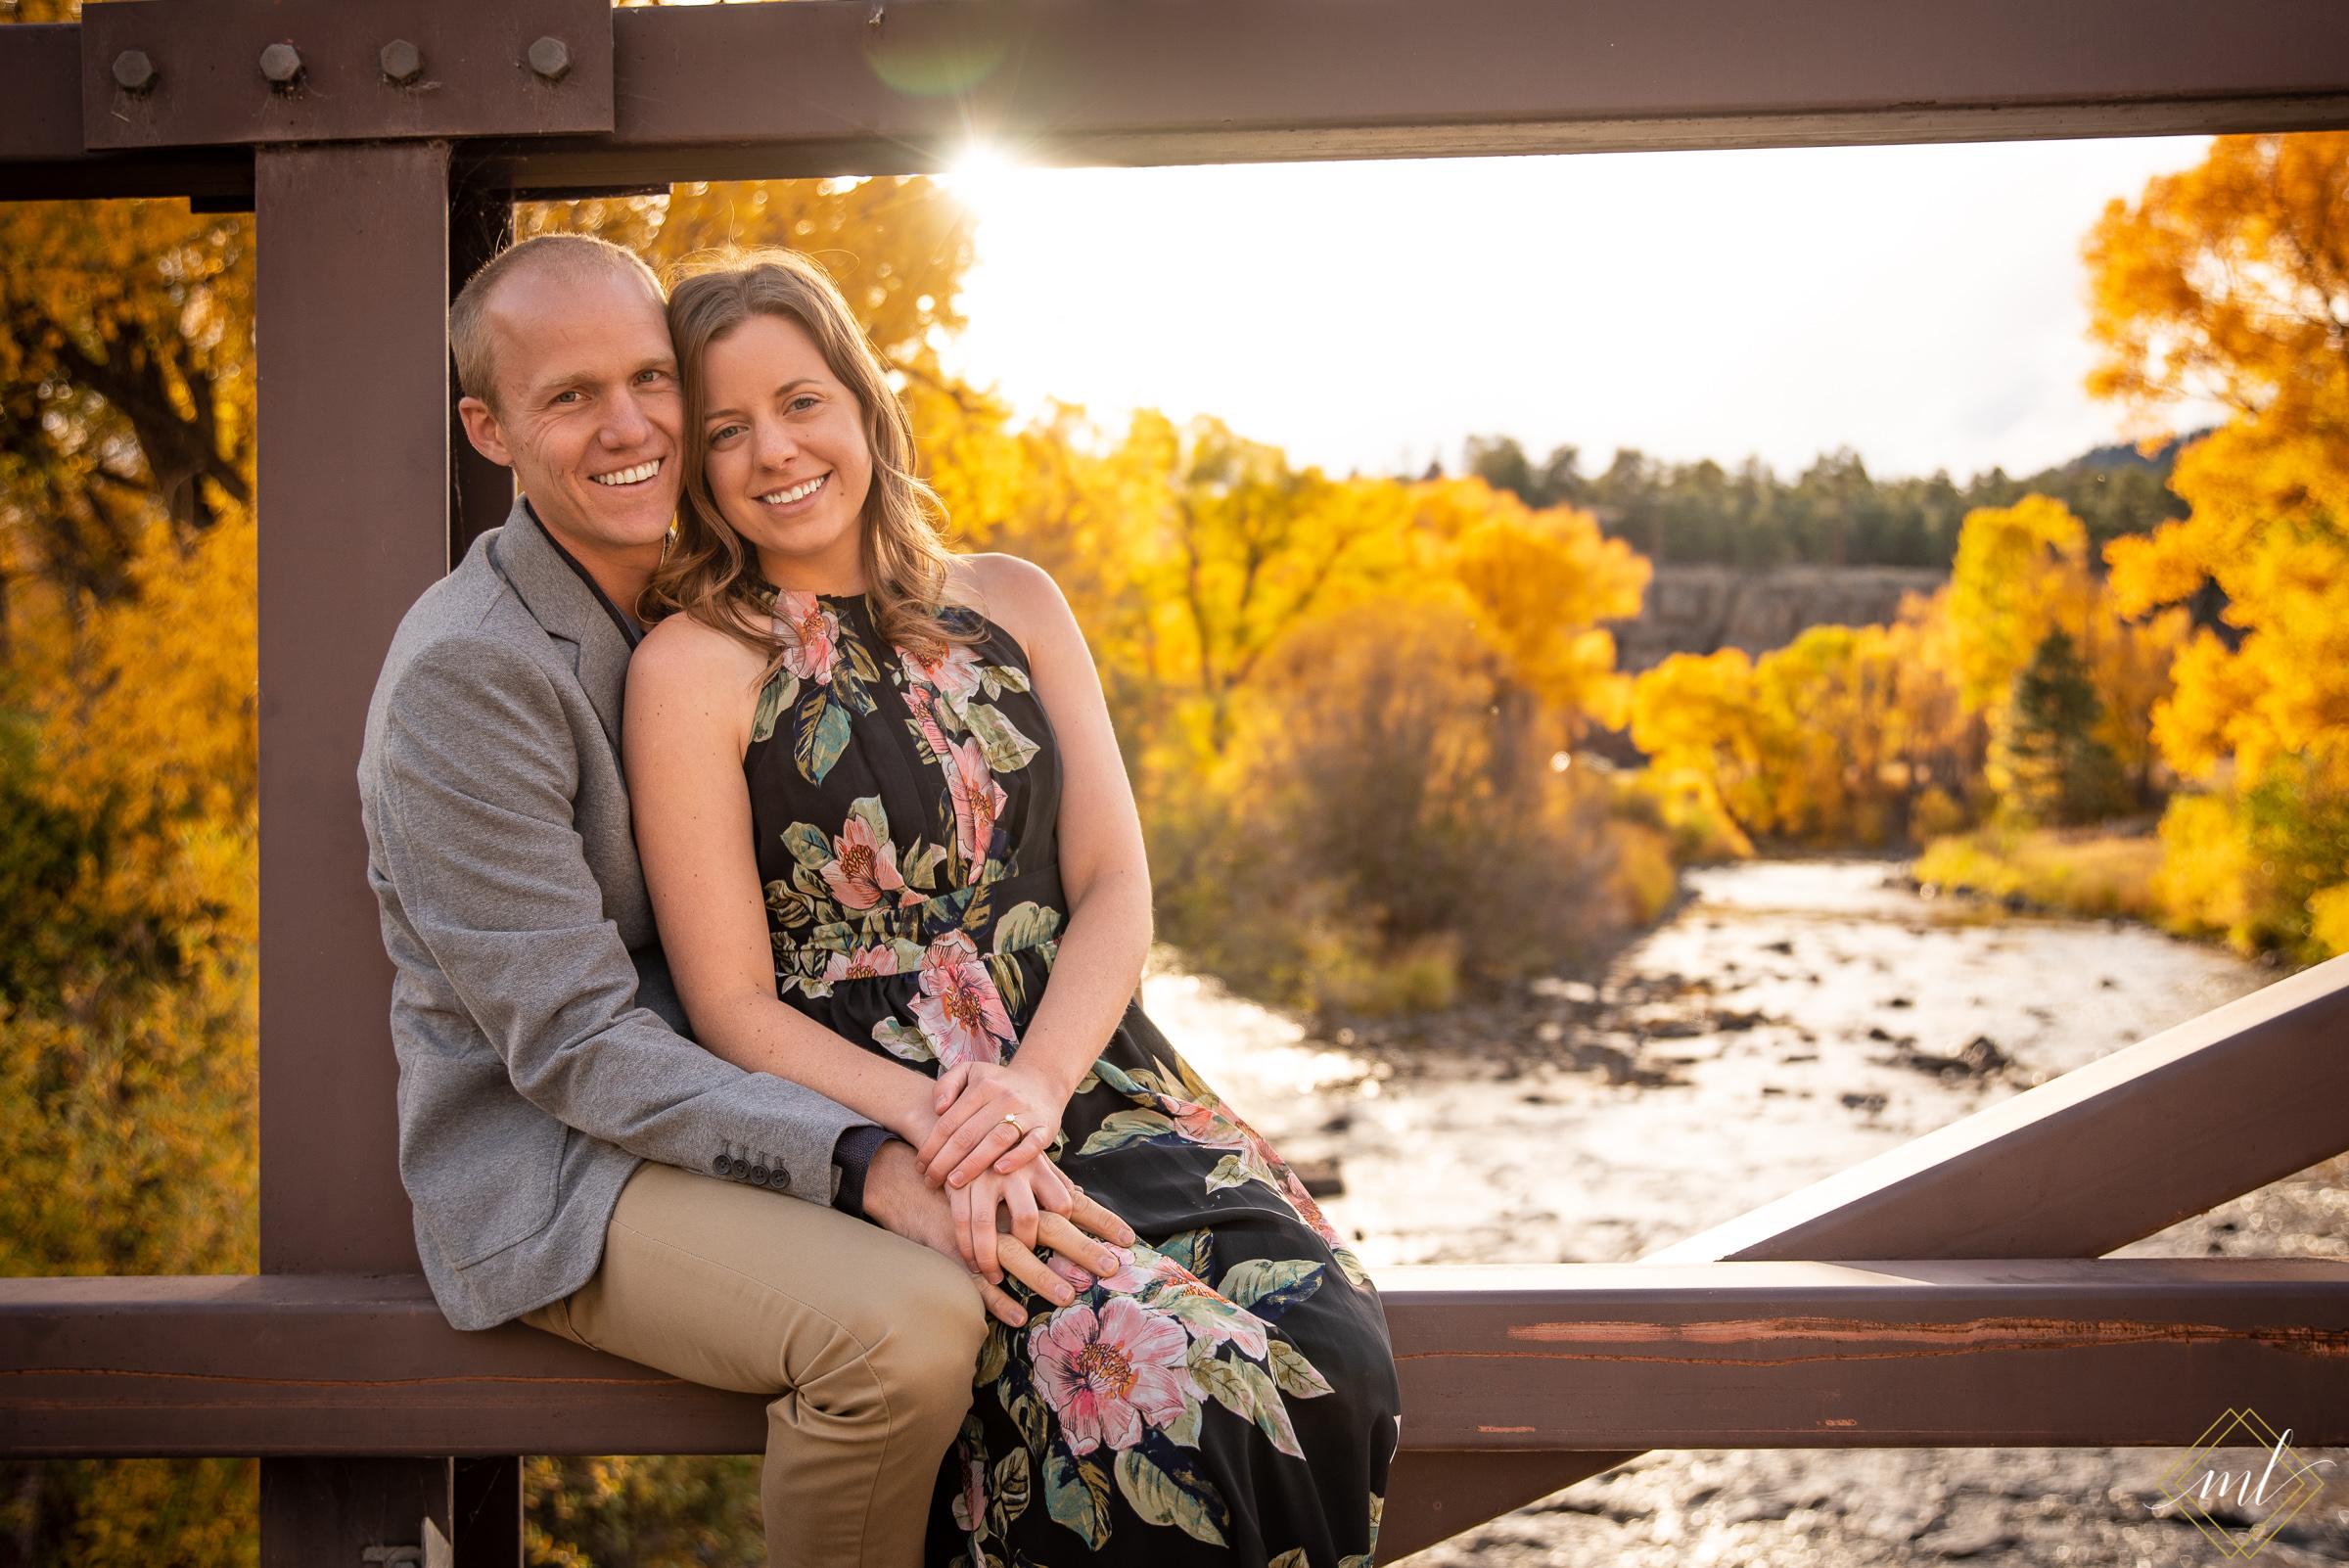 Monika B. Leopold Photography // Durango, Colorado // Engagement Session